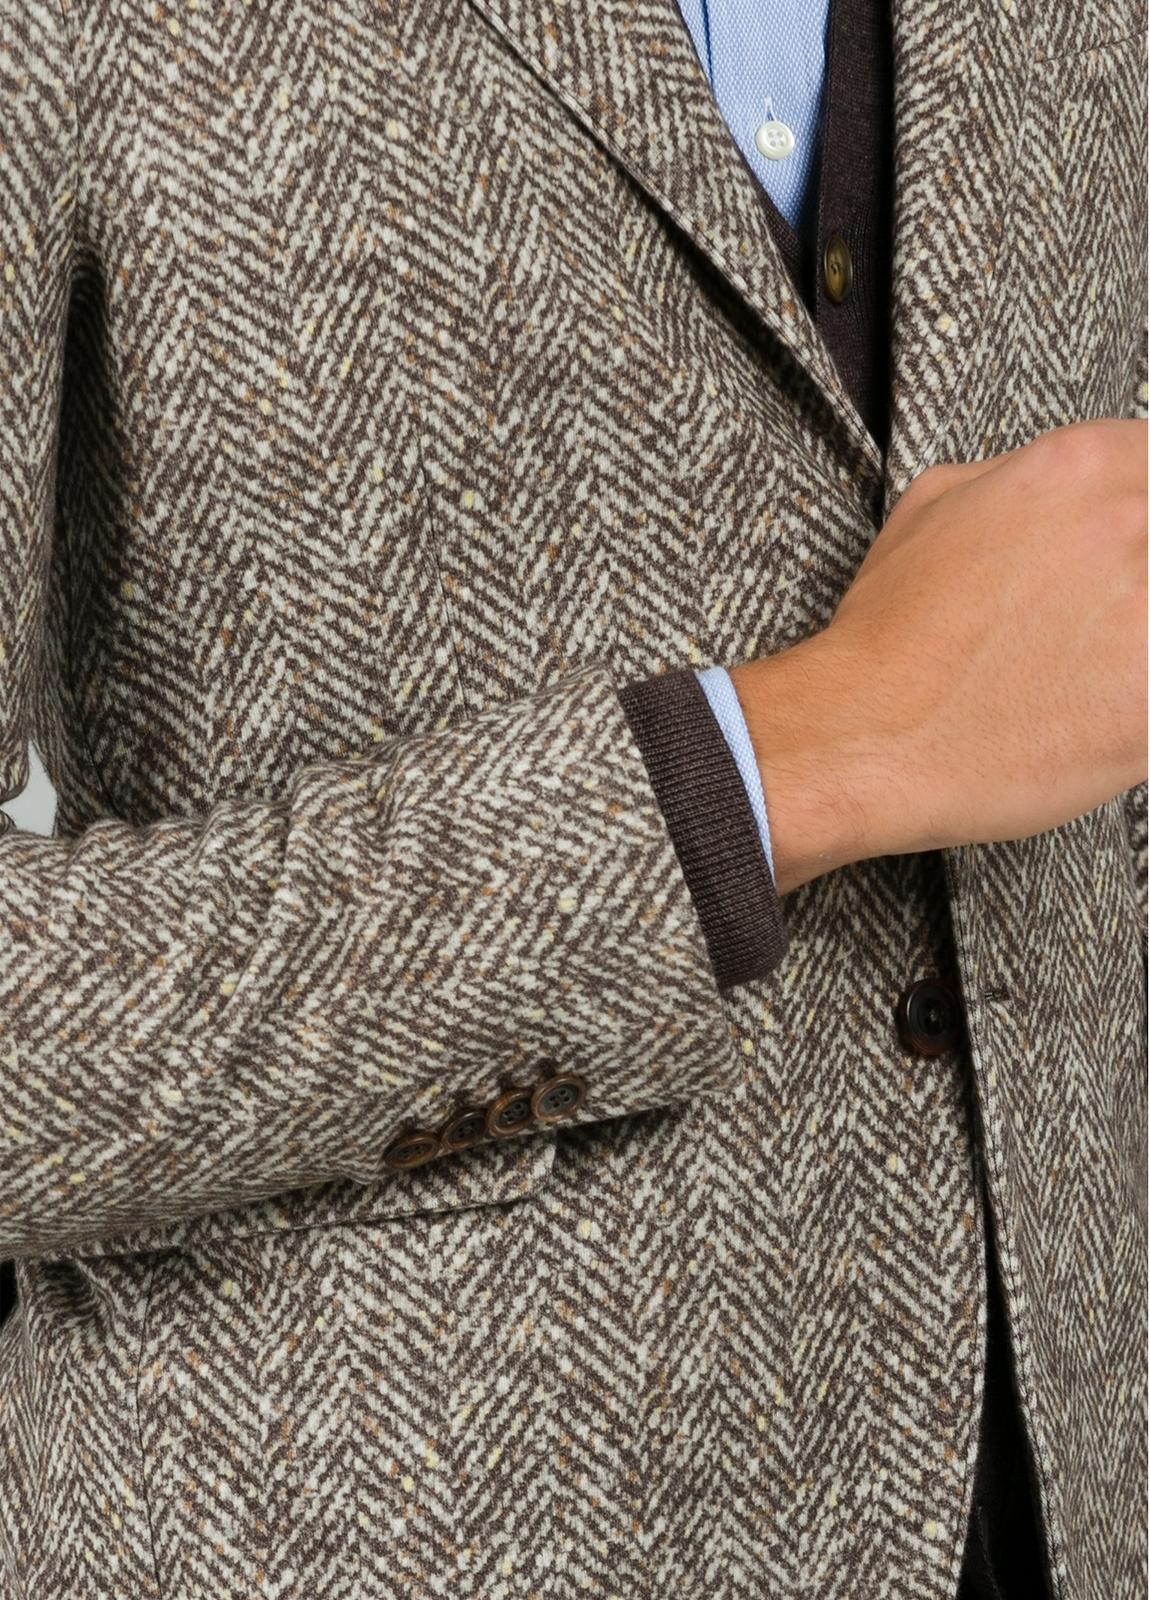 Americana soft 2 botones SLIM FIT diseño espiga color beige. Doble felpa. - Ítem4